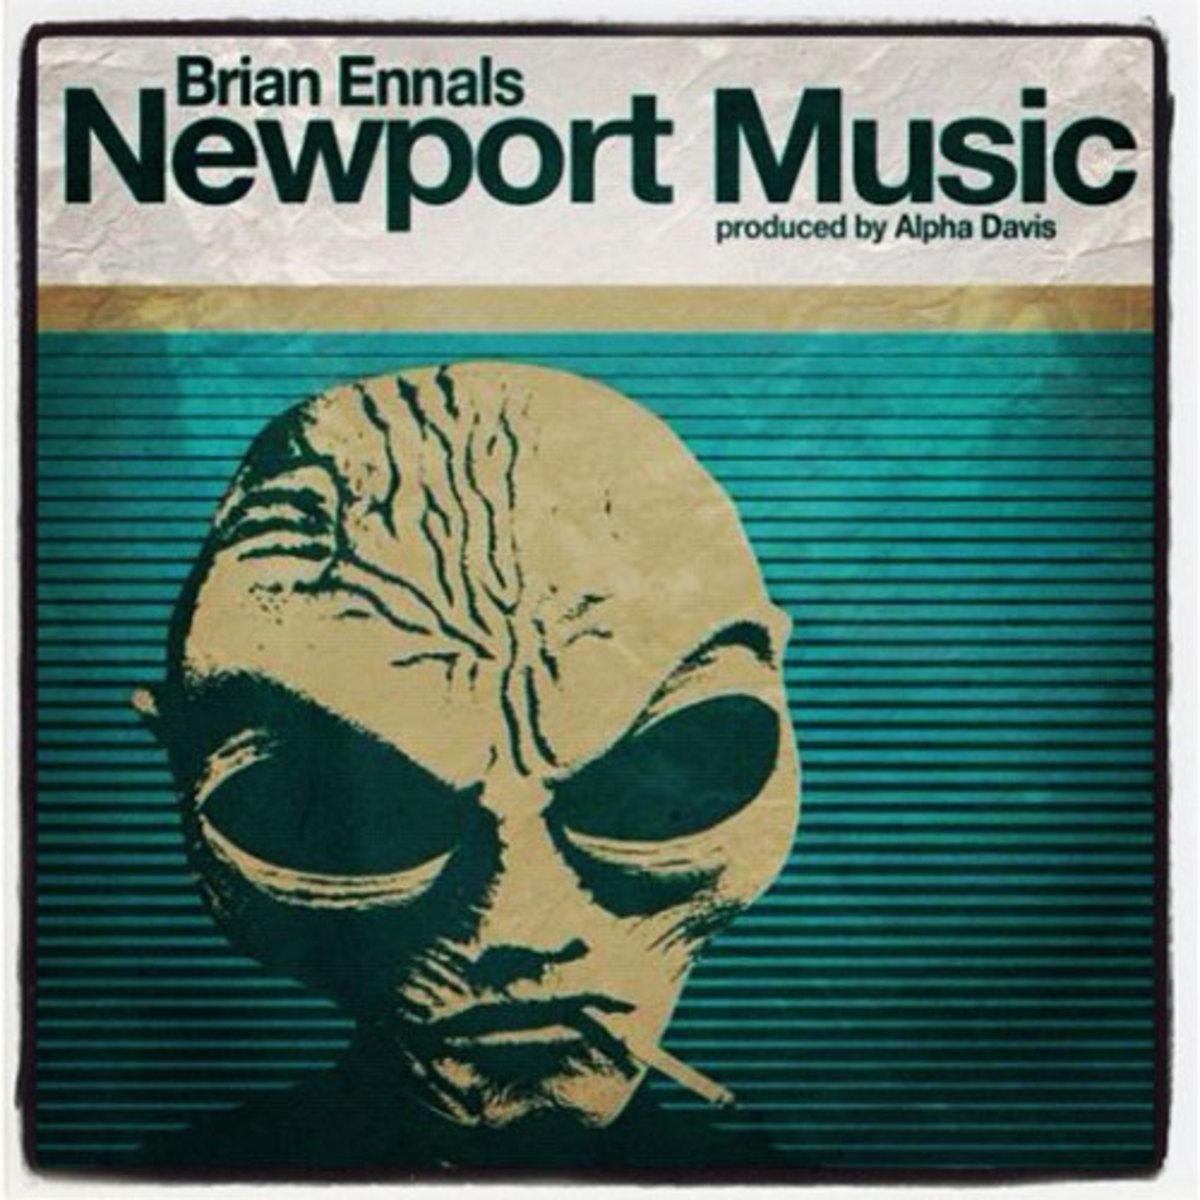 brianennals-newportmusic.jpg